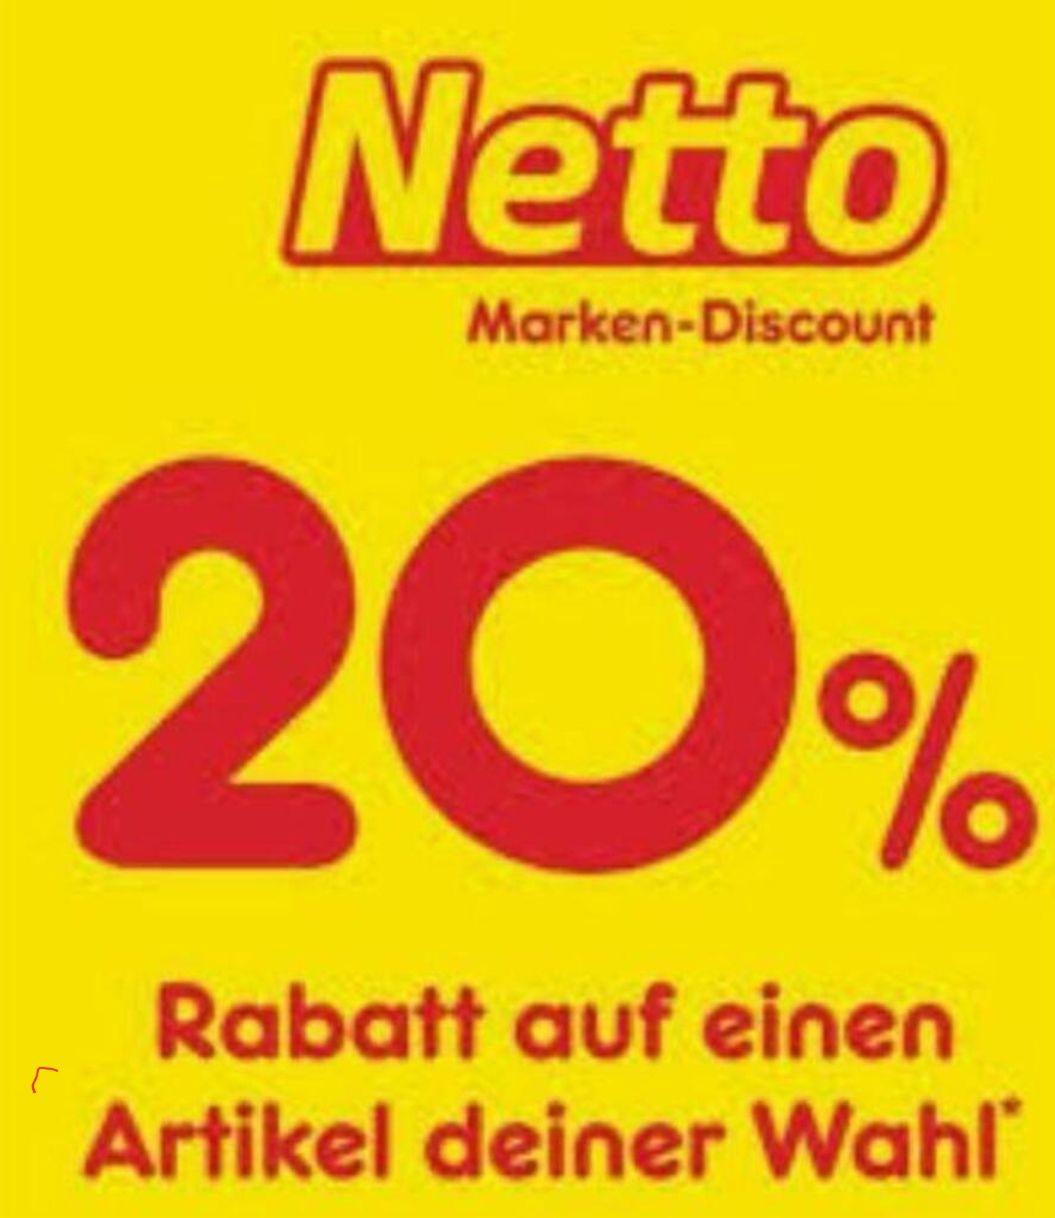 [Netto MD] Rabatt Coupons KW38 (14.09. - 19.09.), bundesweit einsetzbar